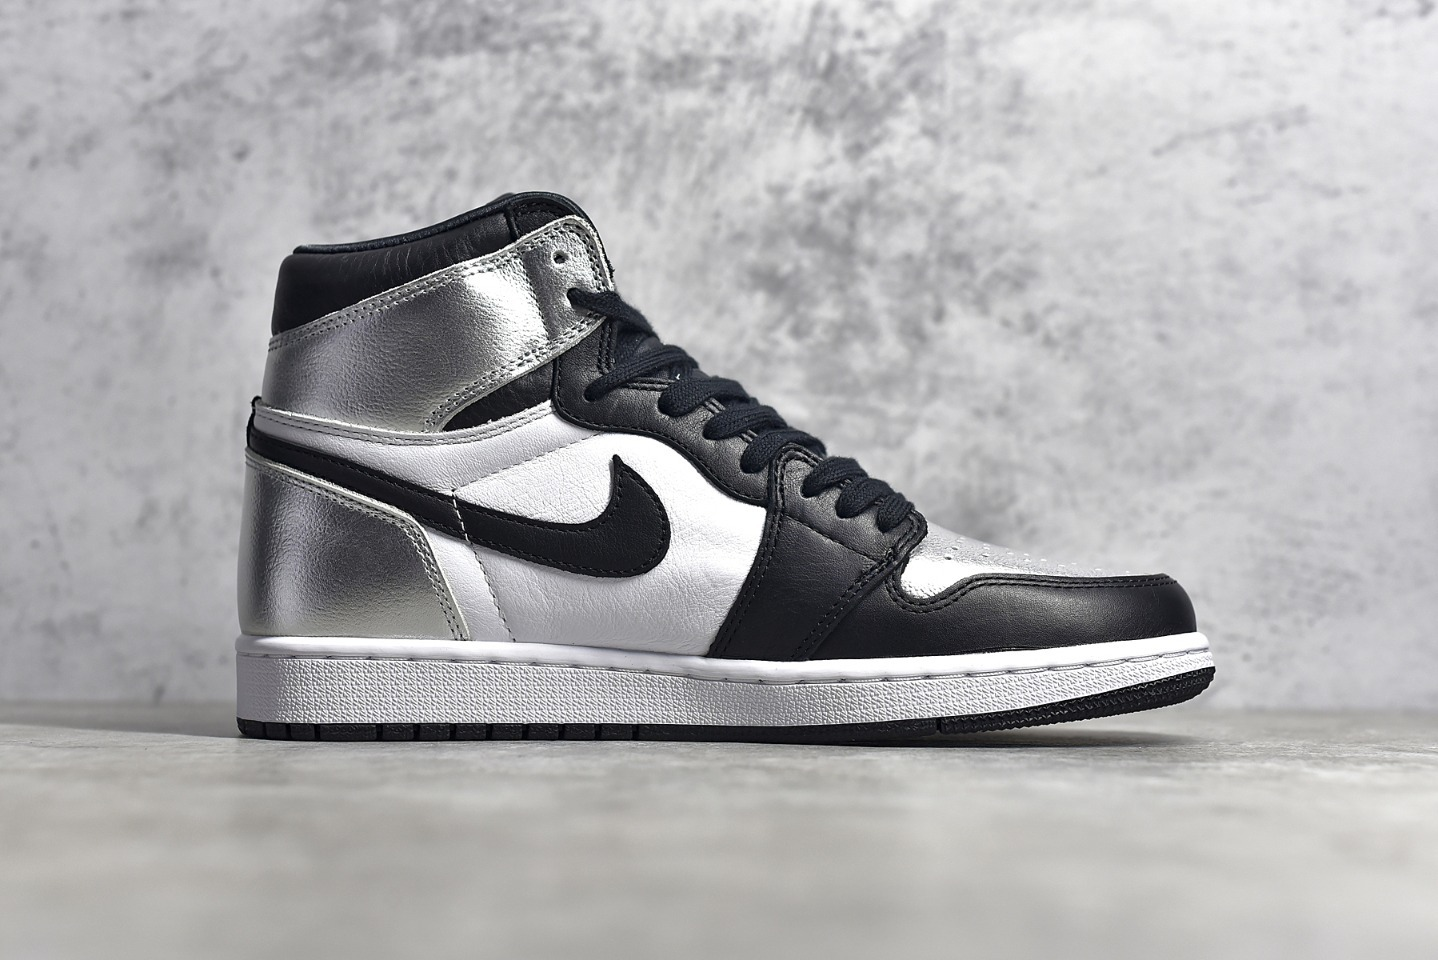 AJ1黑银高帮文化篮球鞋 Air Jordan 1 High OG 原厂AJ黑银SG纯原版本 货号:CD0461-001-潮流者之家